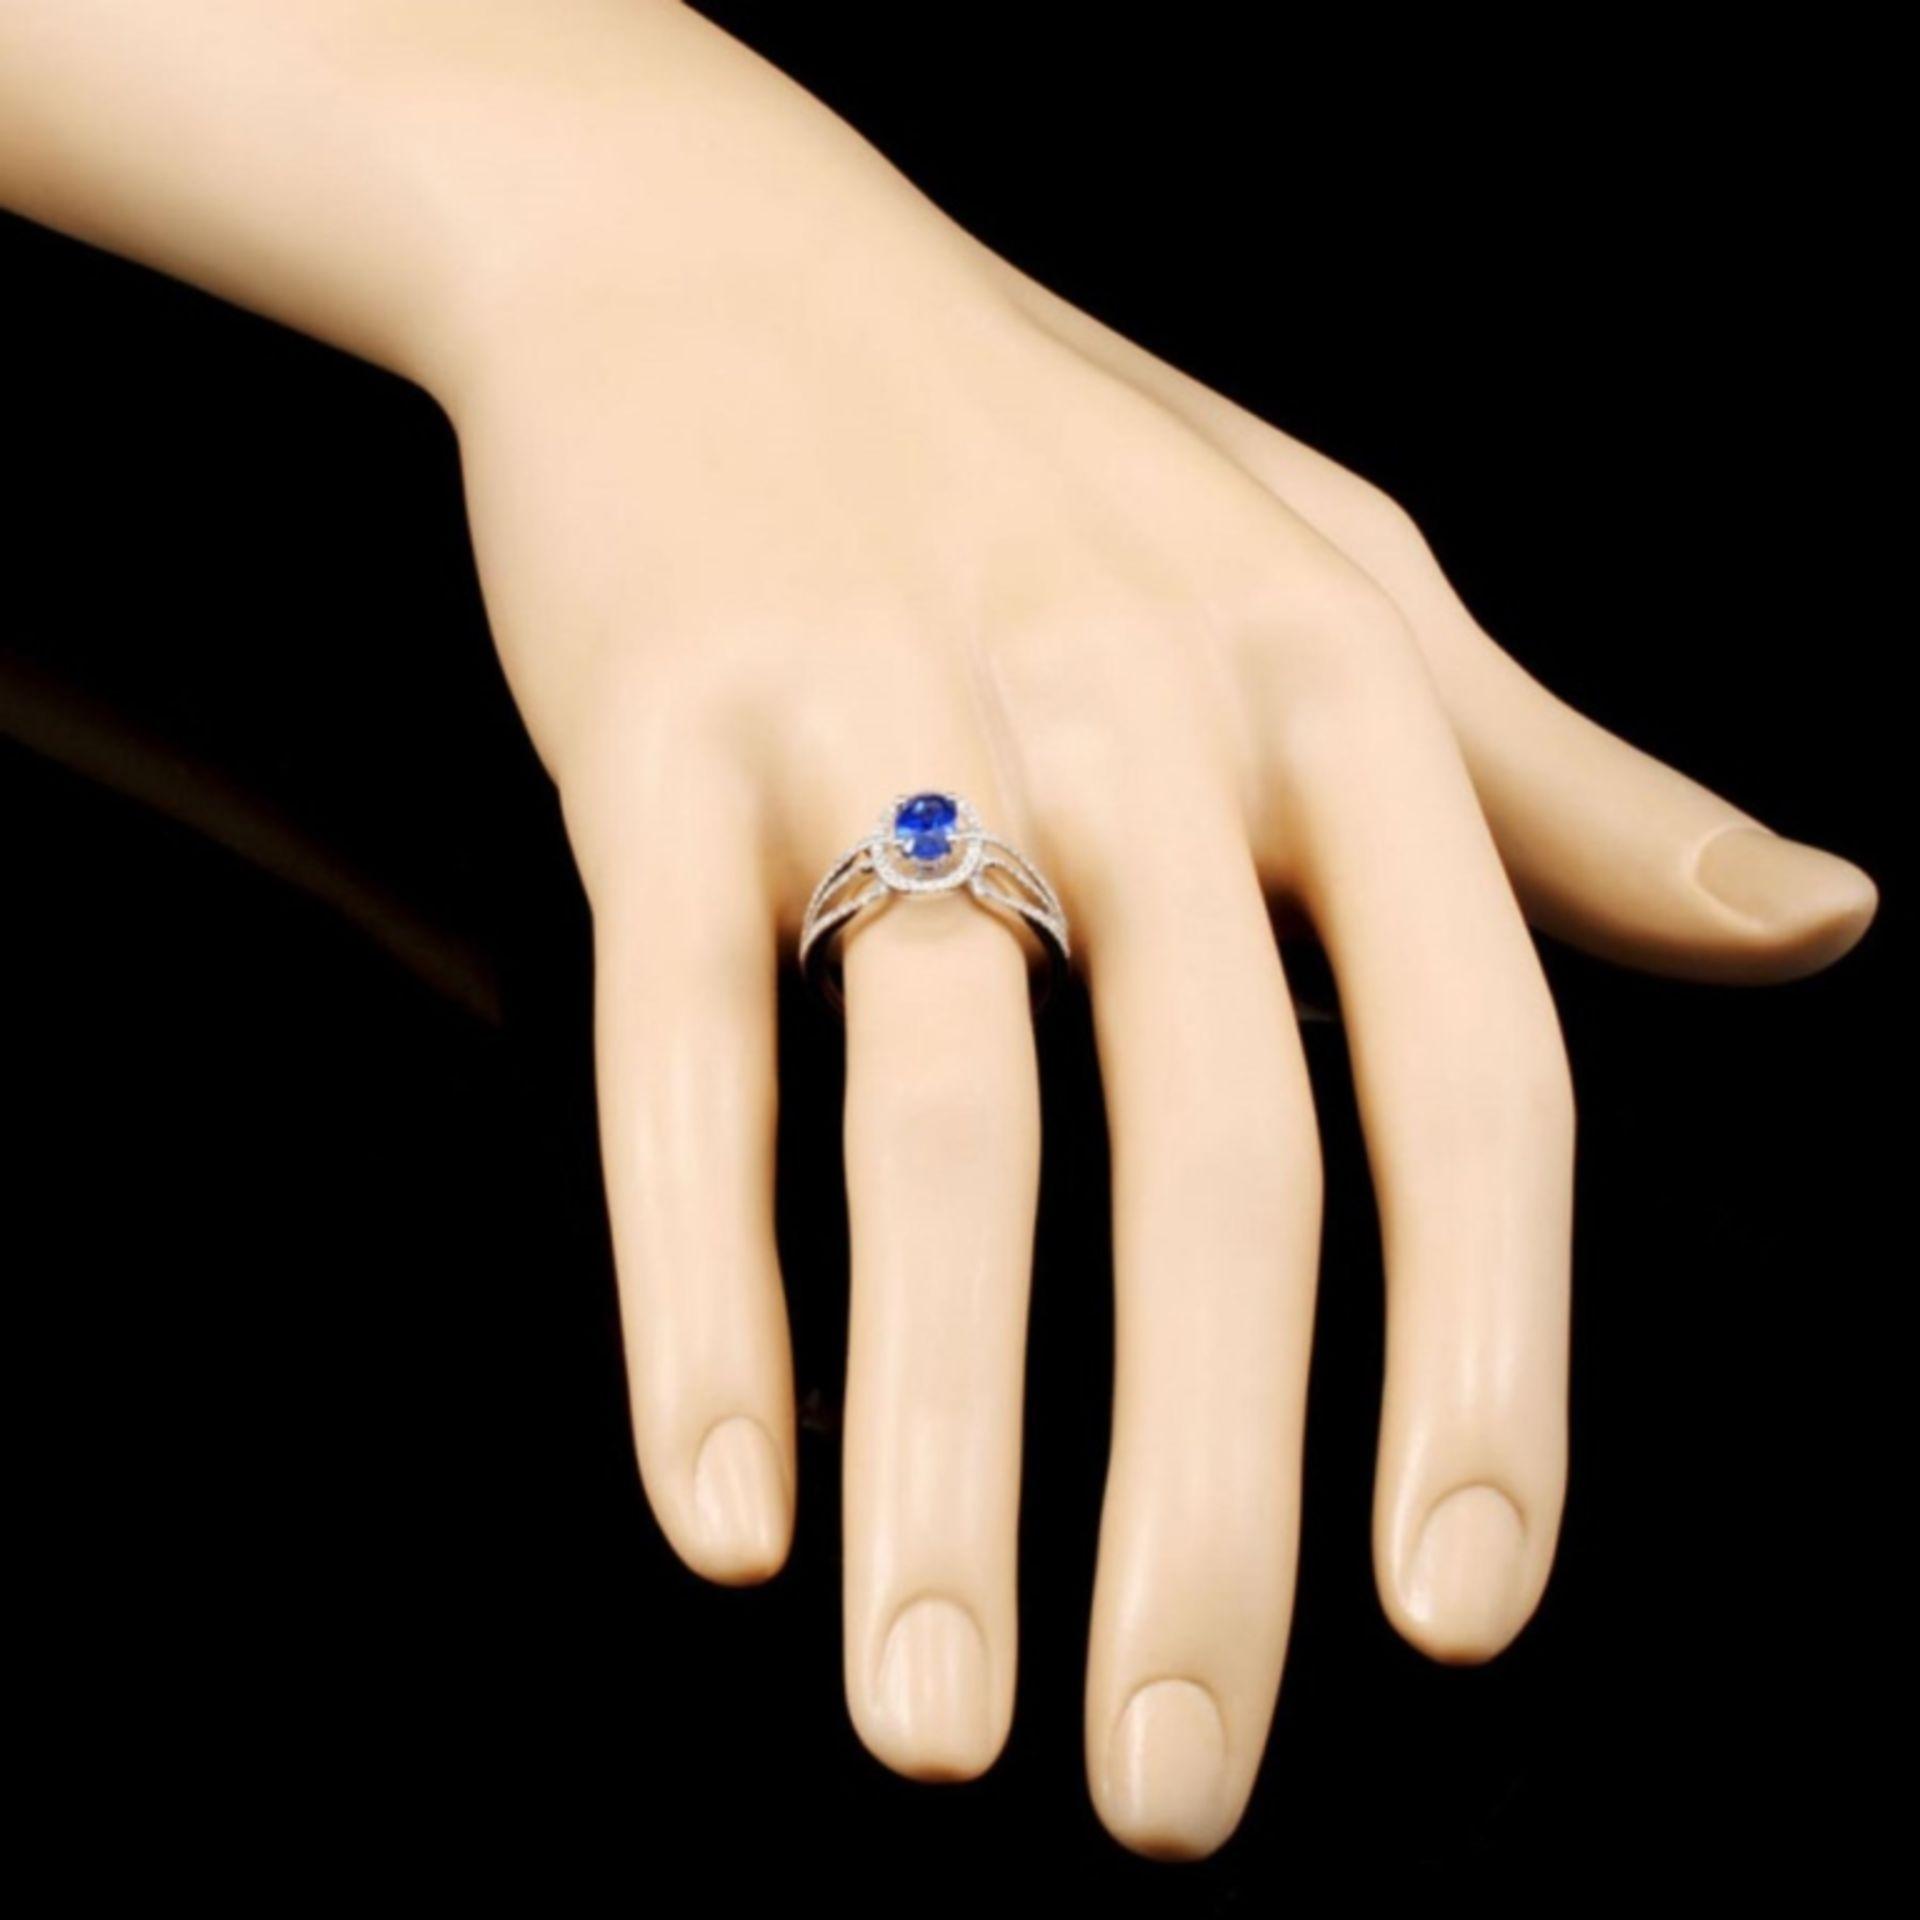 18K Gold 0.86ct Sapphire & 0.32ctw Diamond Ring - Image 3 of 5